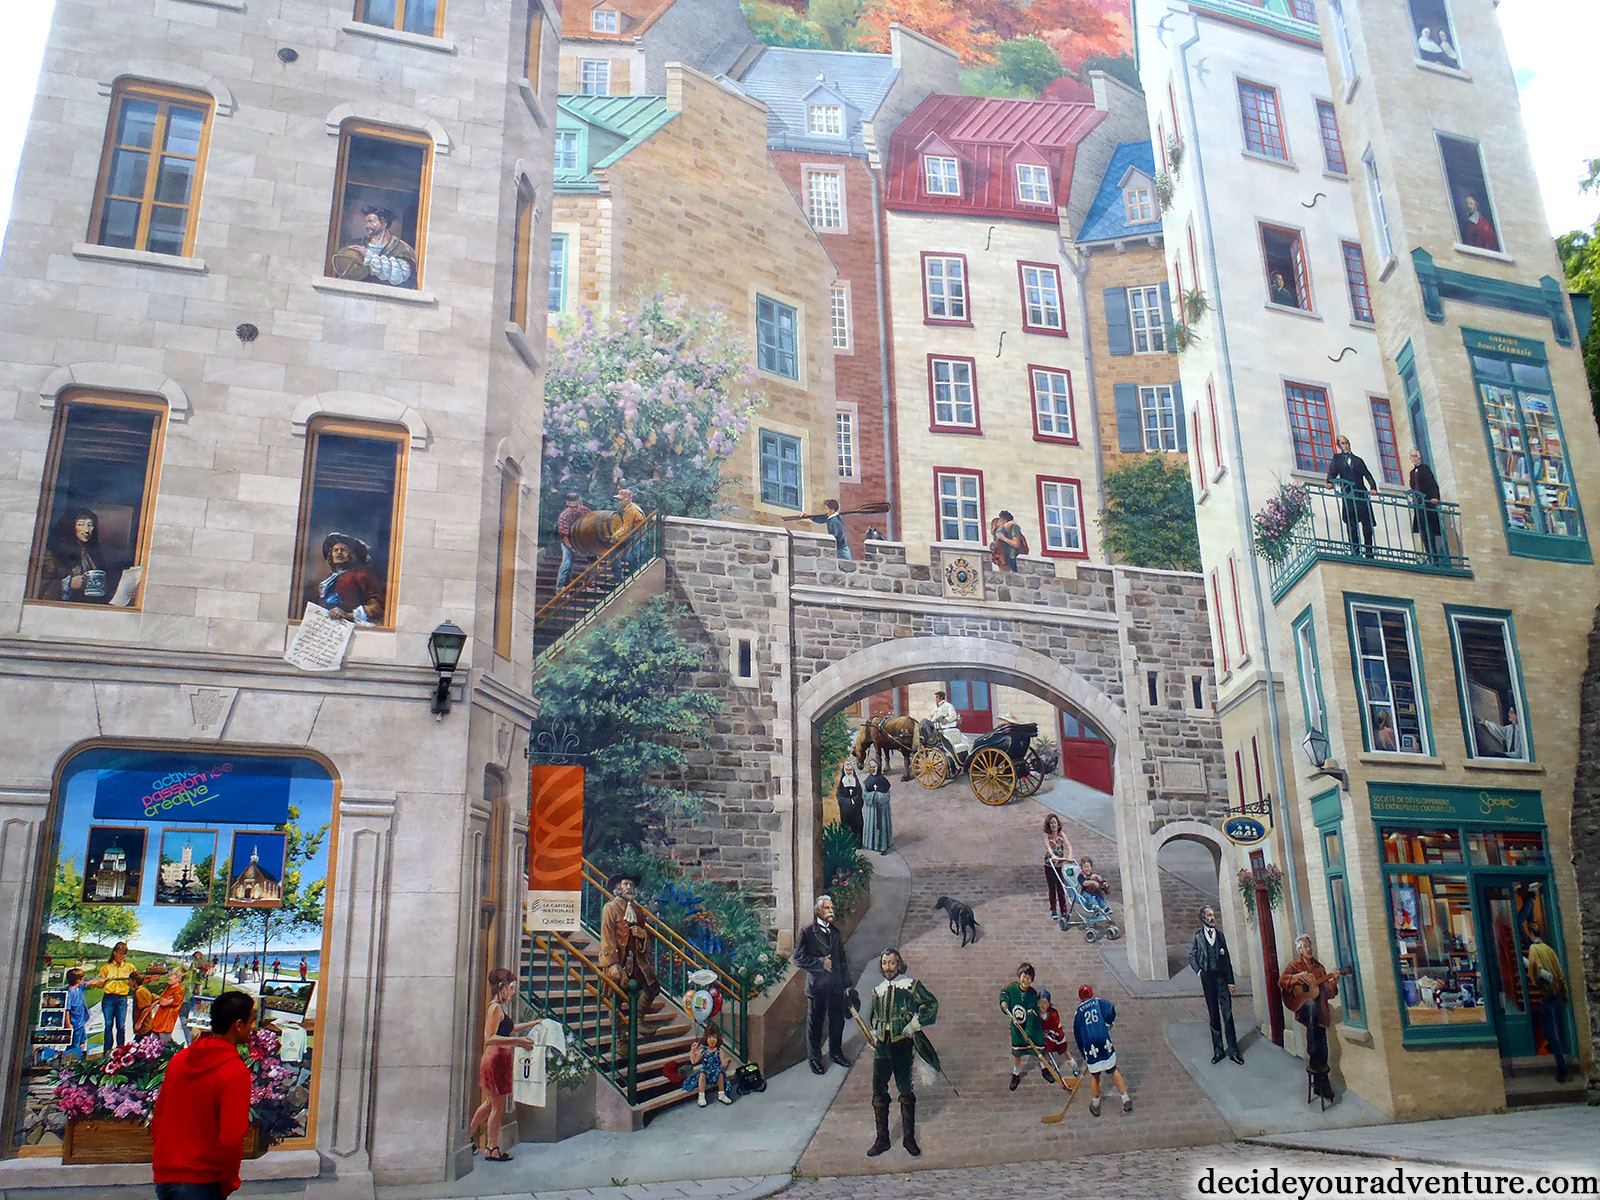 Old Québec City, Québec Province, Canada | Decide Your ...